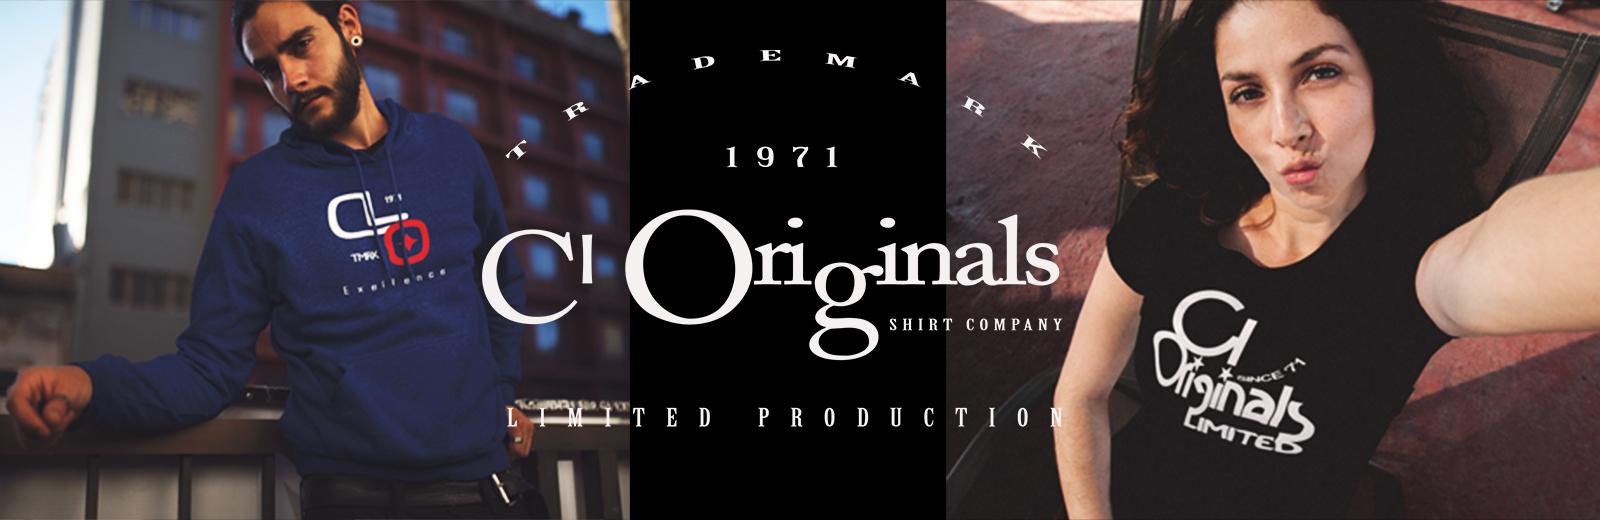 Cl Originals Store